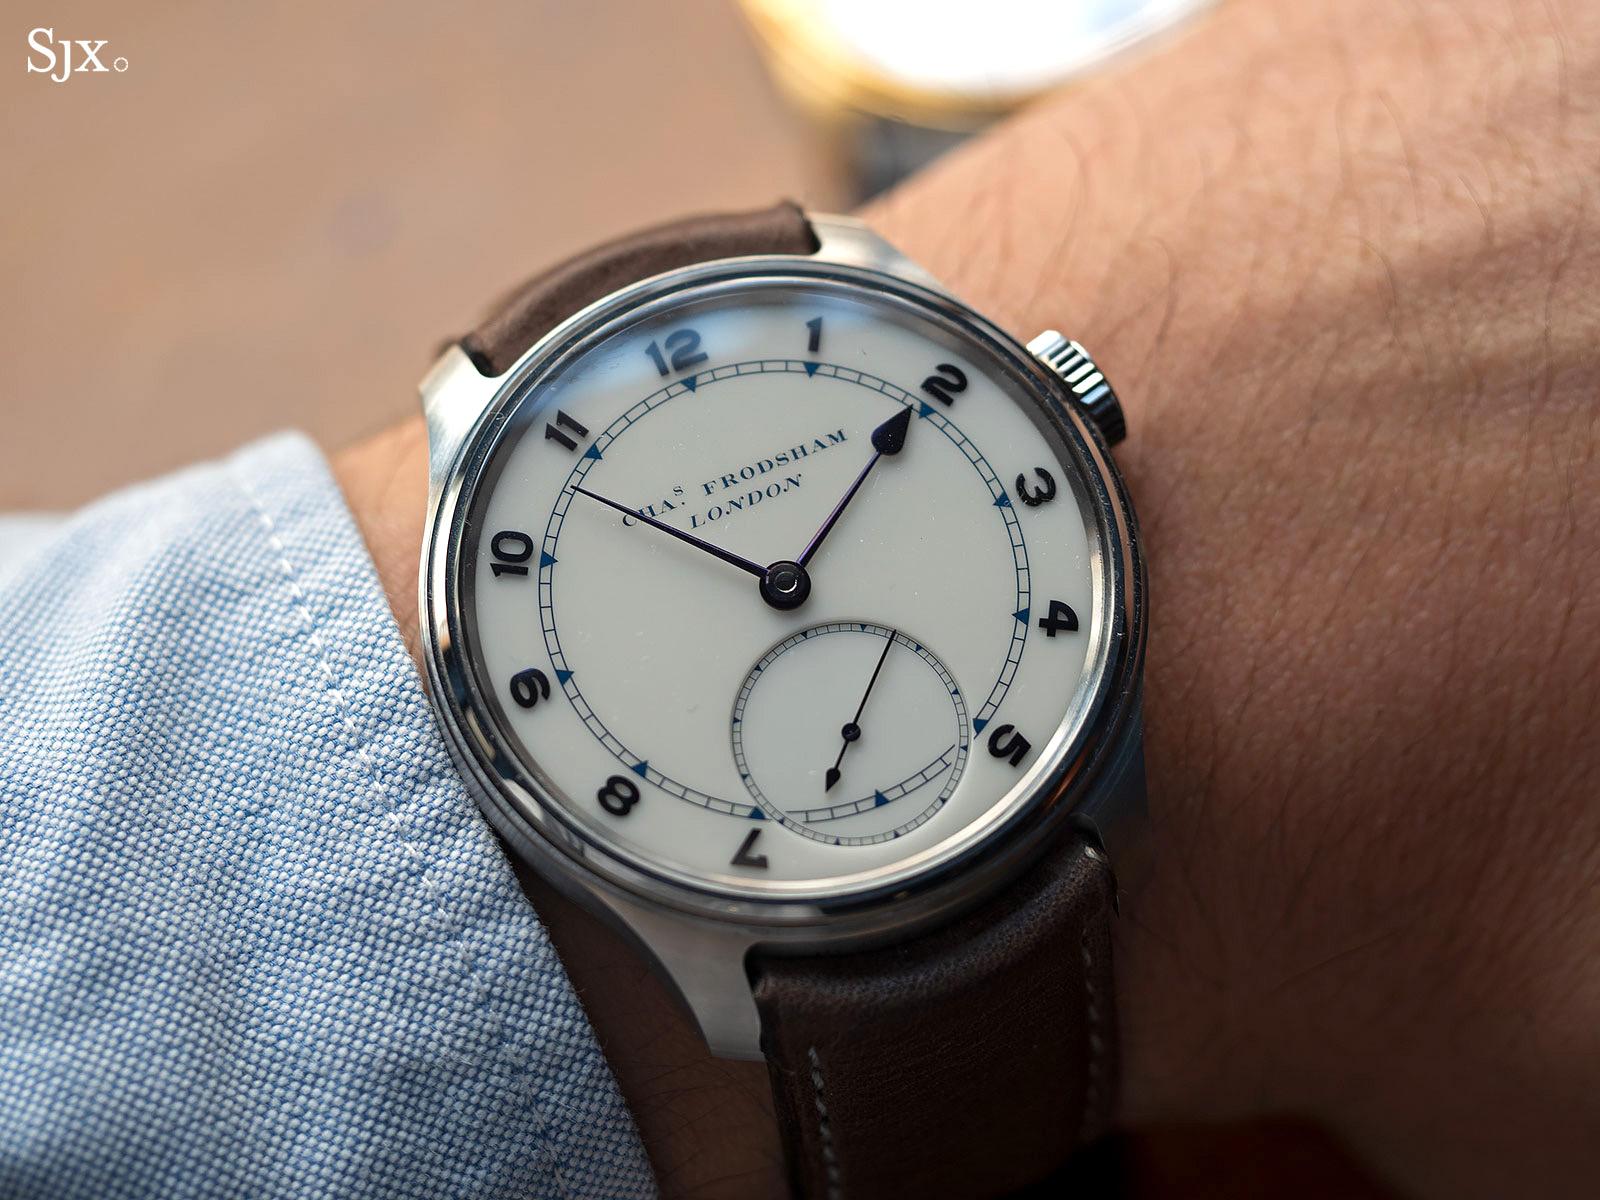 Charles Frodsham Double Impulse chronometer wristwatch 3